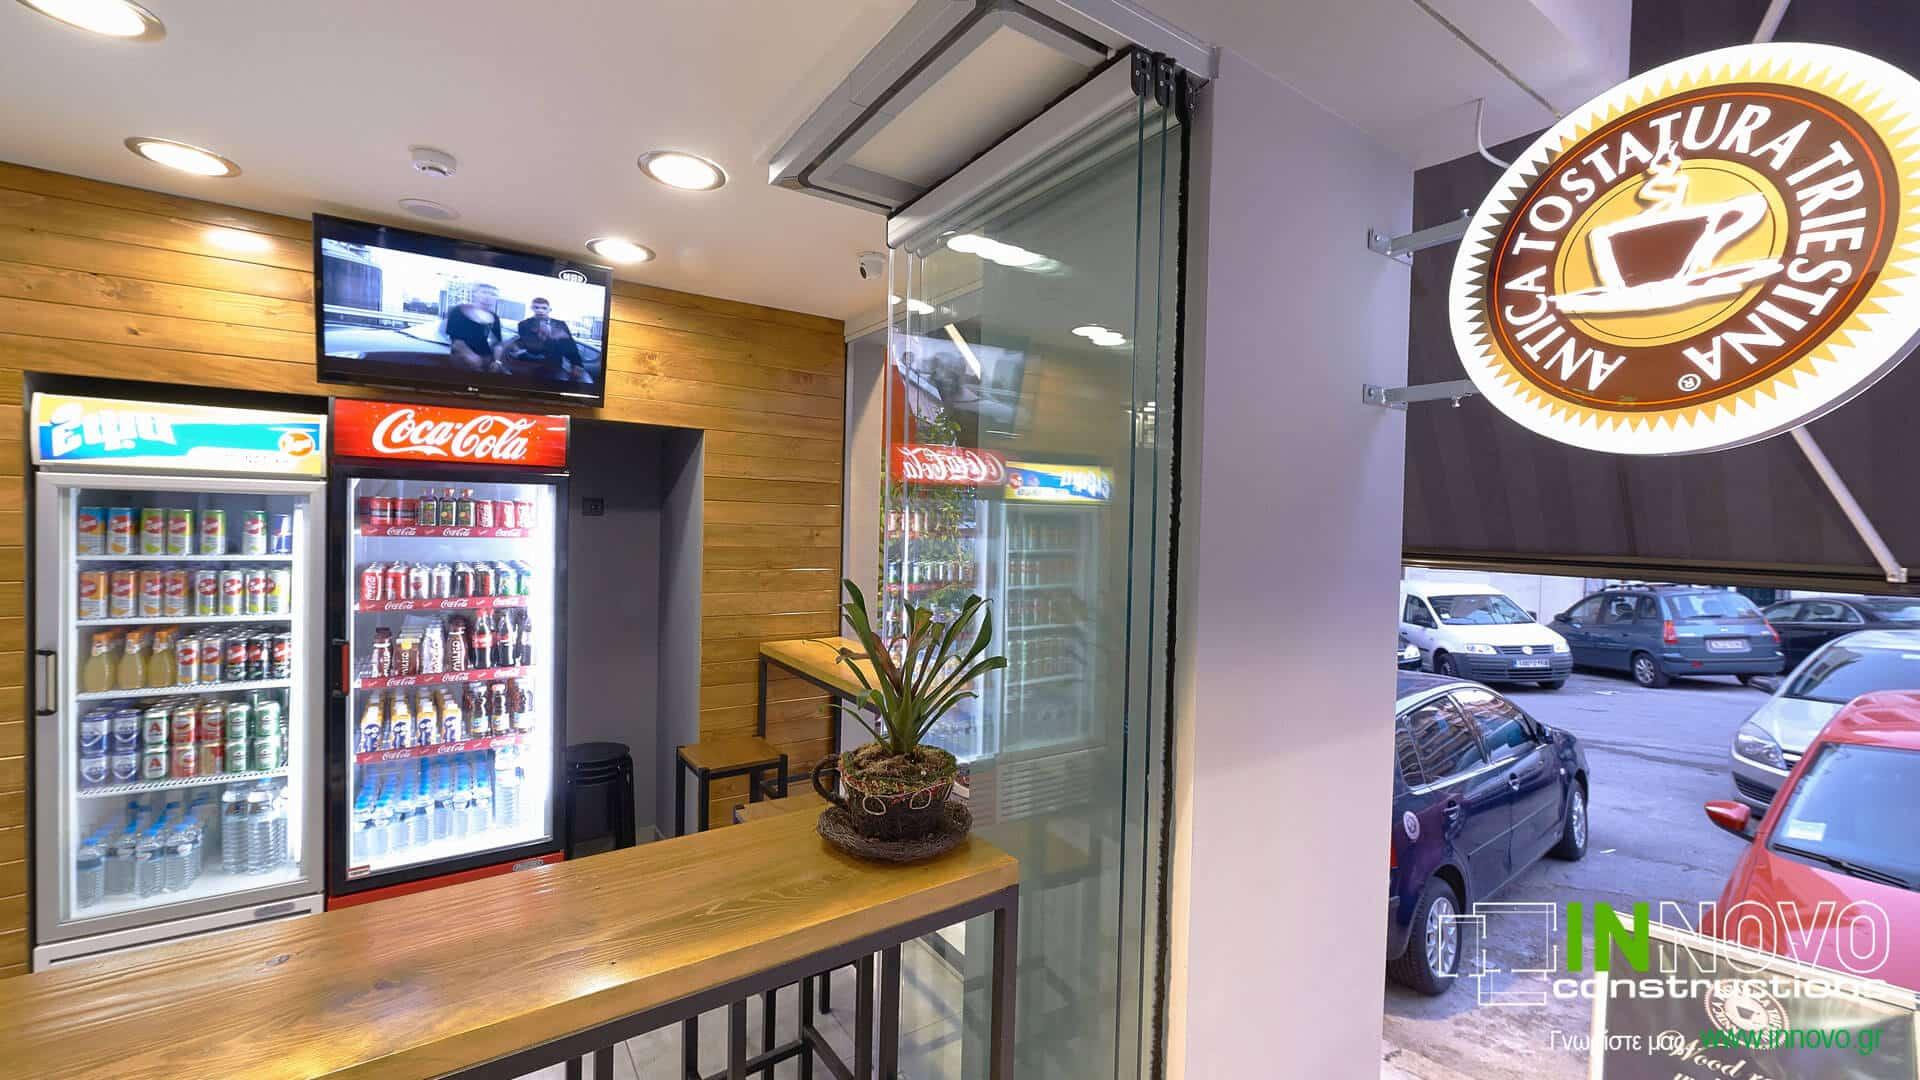 anakainisi-snack-cafe-renovation-snack-cafe-peiraias-1545-6